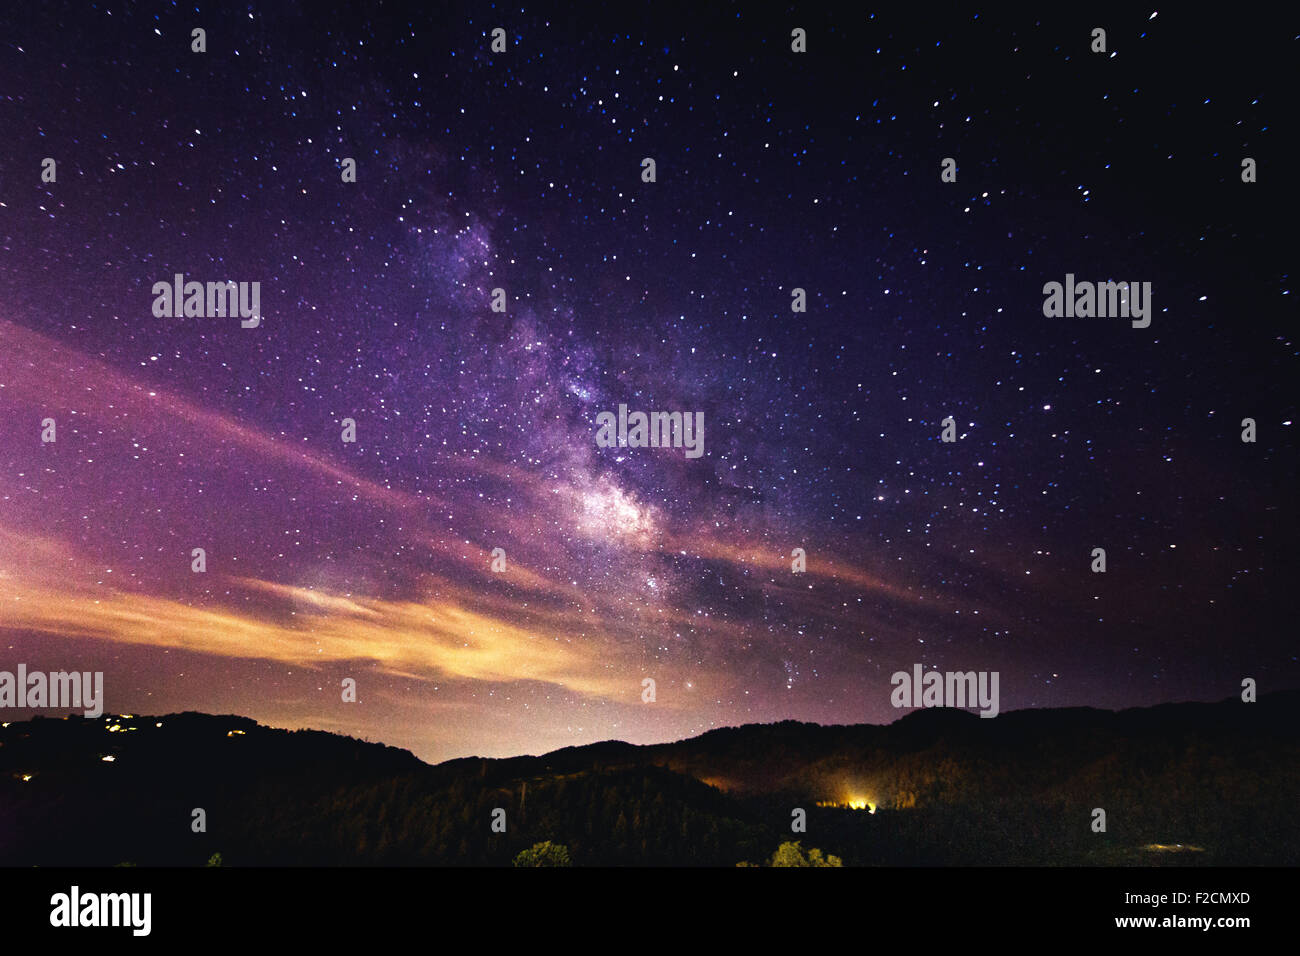 The night sky - stars and Milky Way - Stock Image